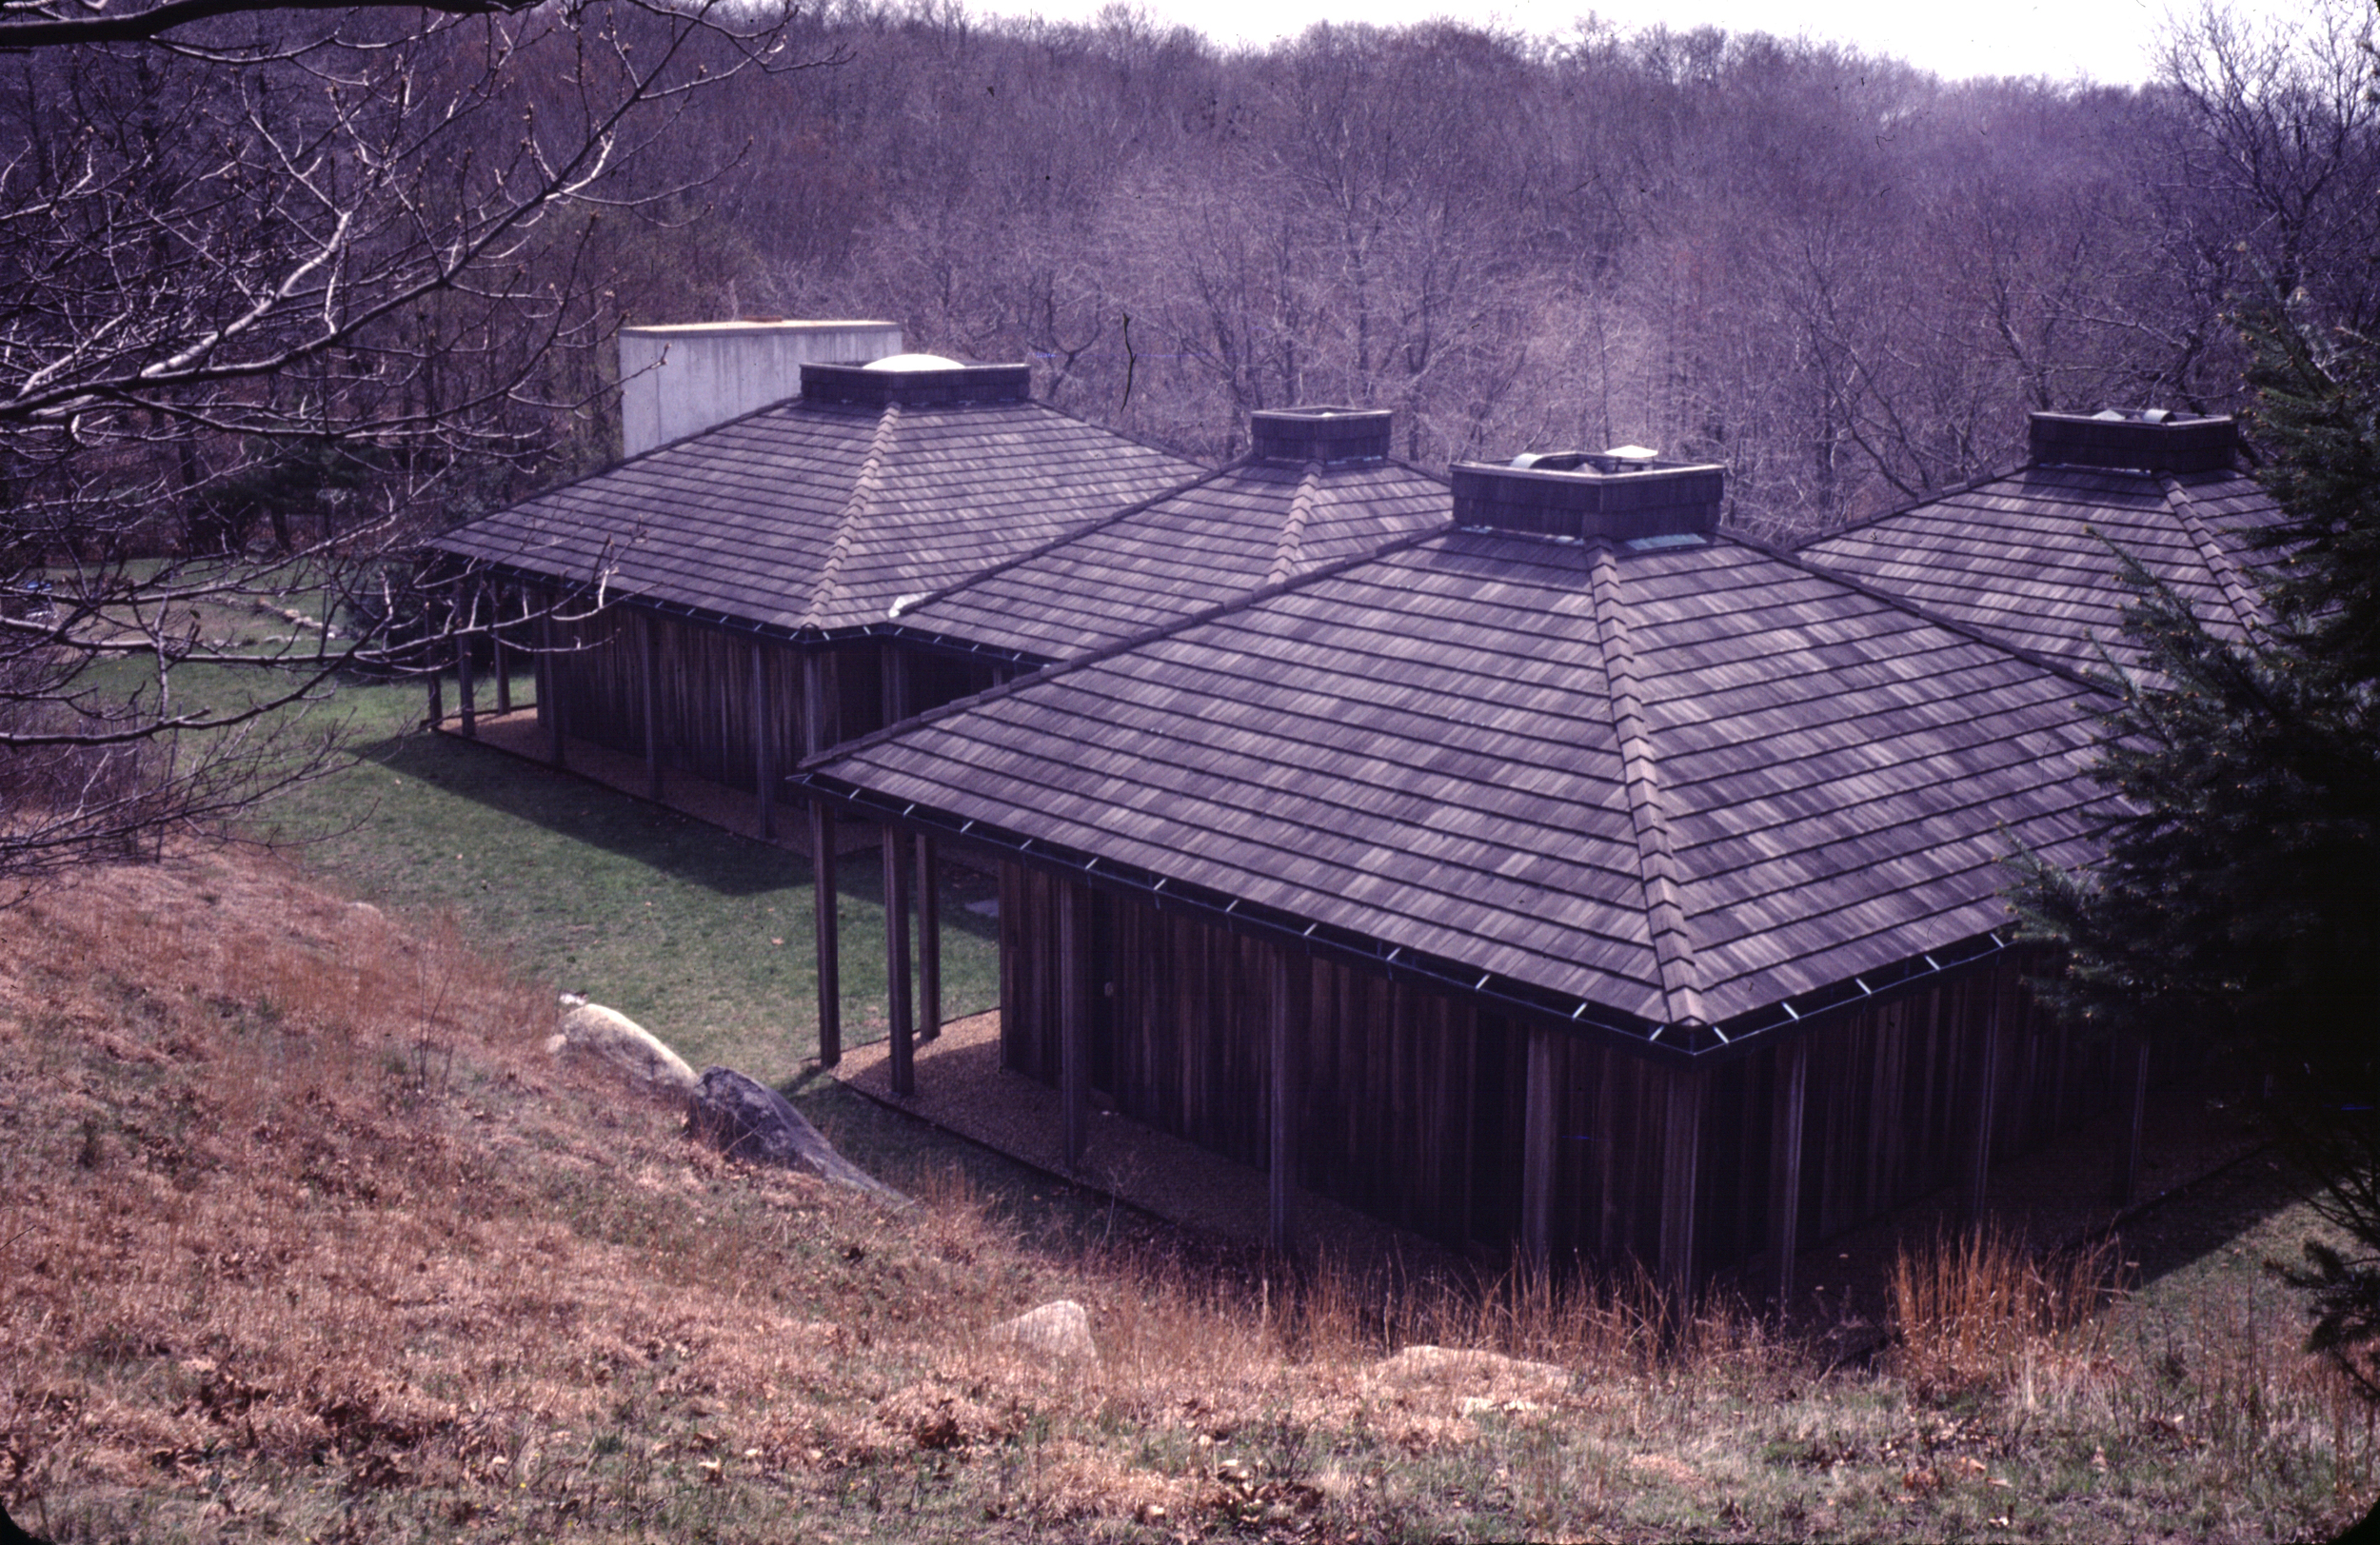 The Thoron Residence